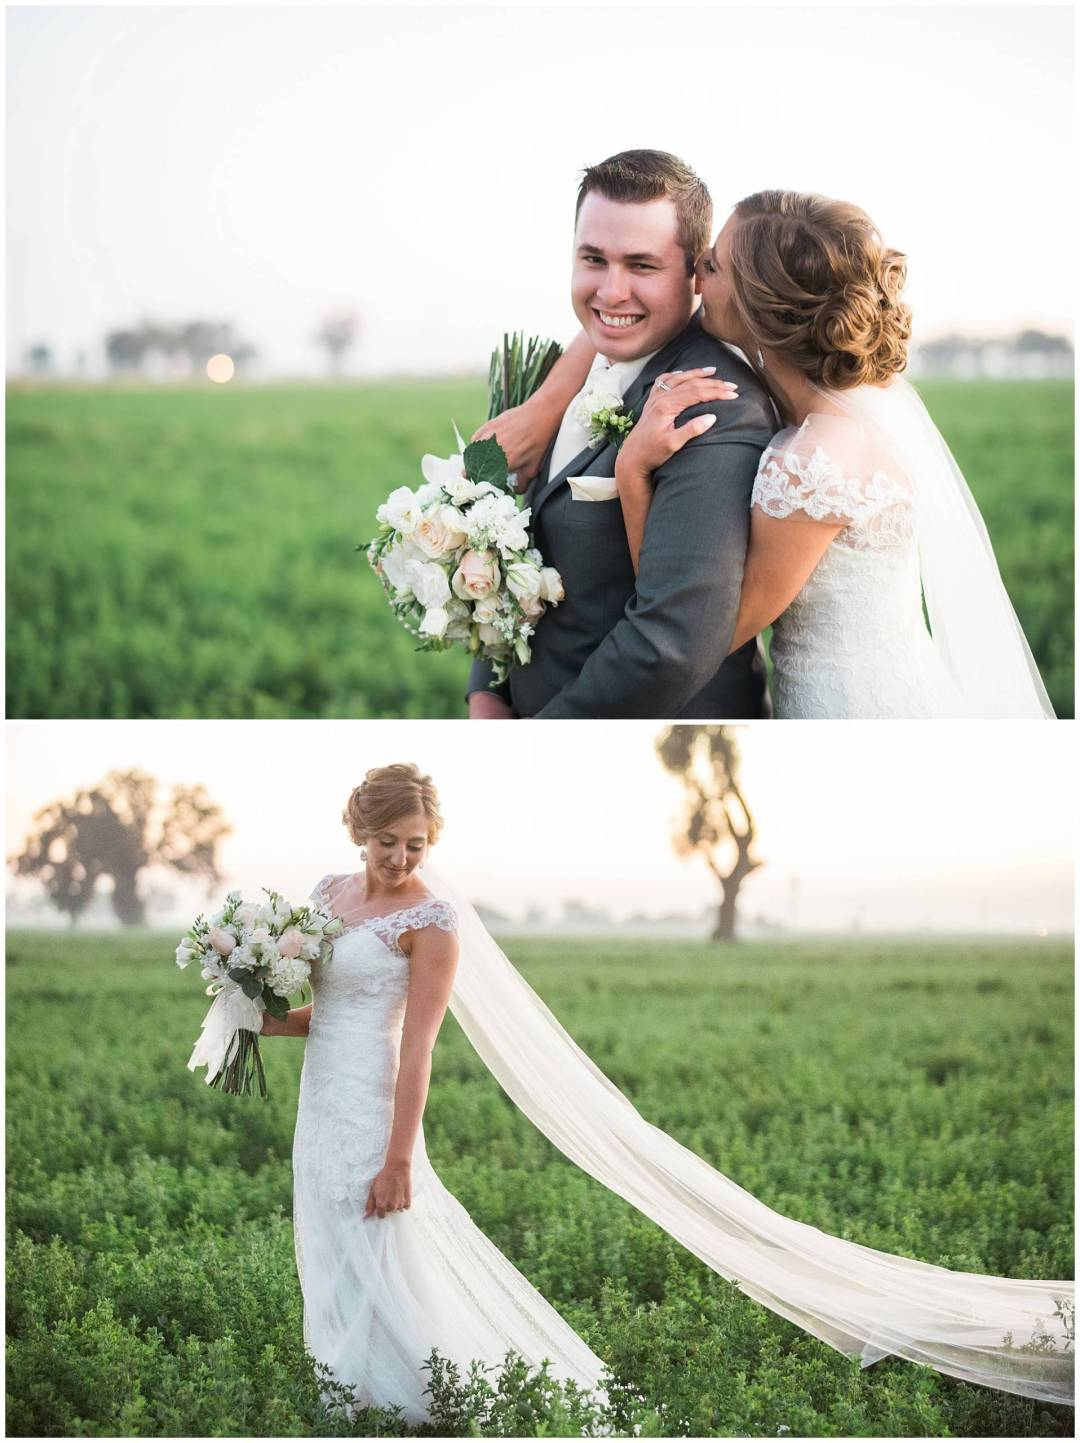 Kelcie & Devin Wedding Third Element Photography & Cinema Koetsier Ranch Visalia Tulare Fresno Hybrid Film Wedding Photographer_0025